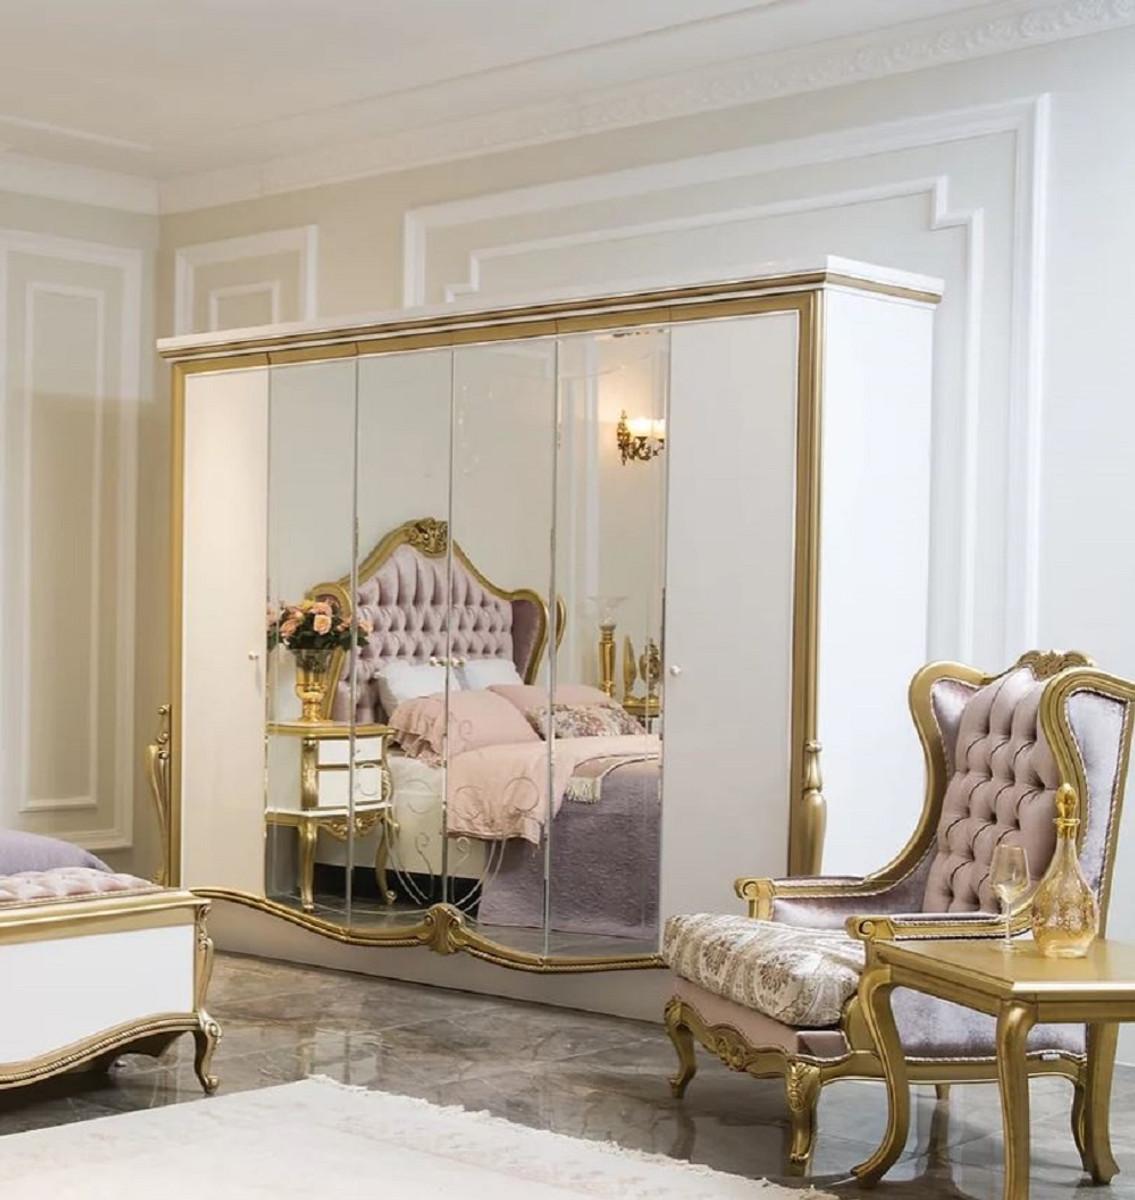 Casa Padrino Luxus Barock Schlafzimmerschrank Weiss Gold 270 X 70 X H 224 Cm Edler Massivholz Kleiderschrank Schlafzimmer Mobel Im Barockstil Luxus Qualitat